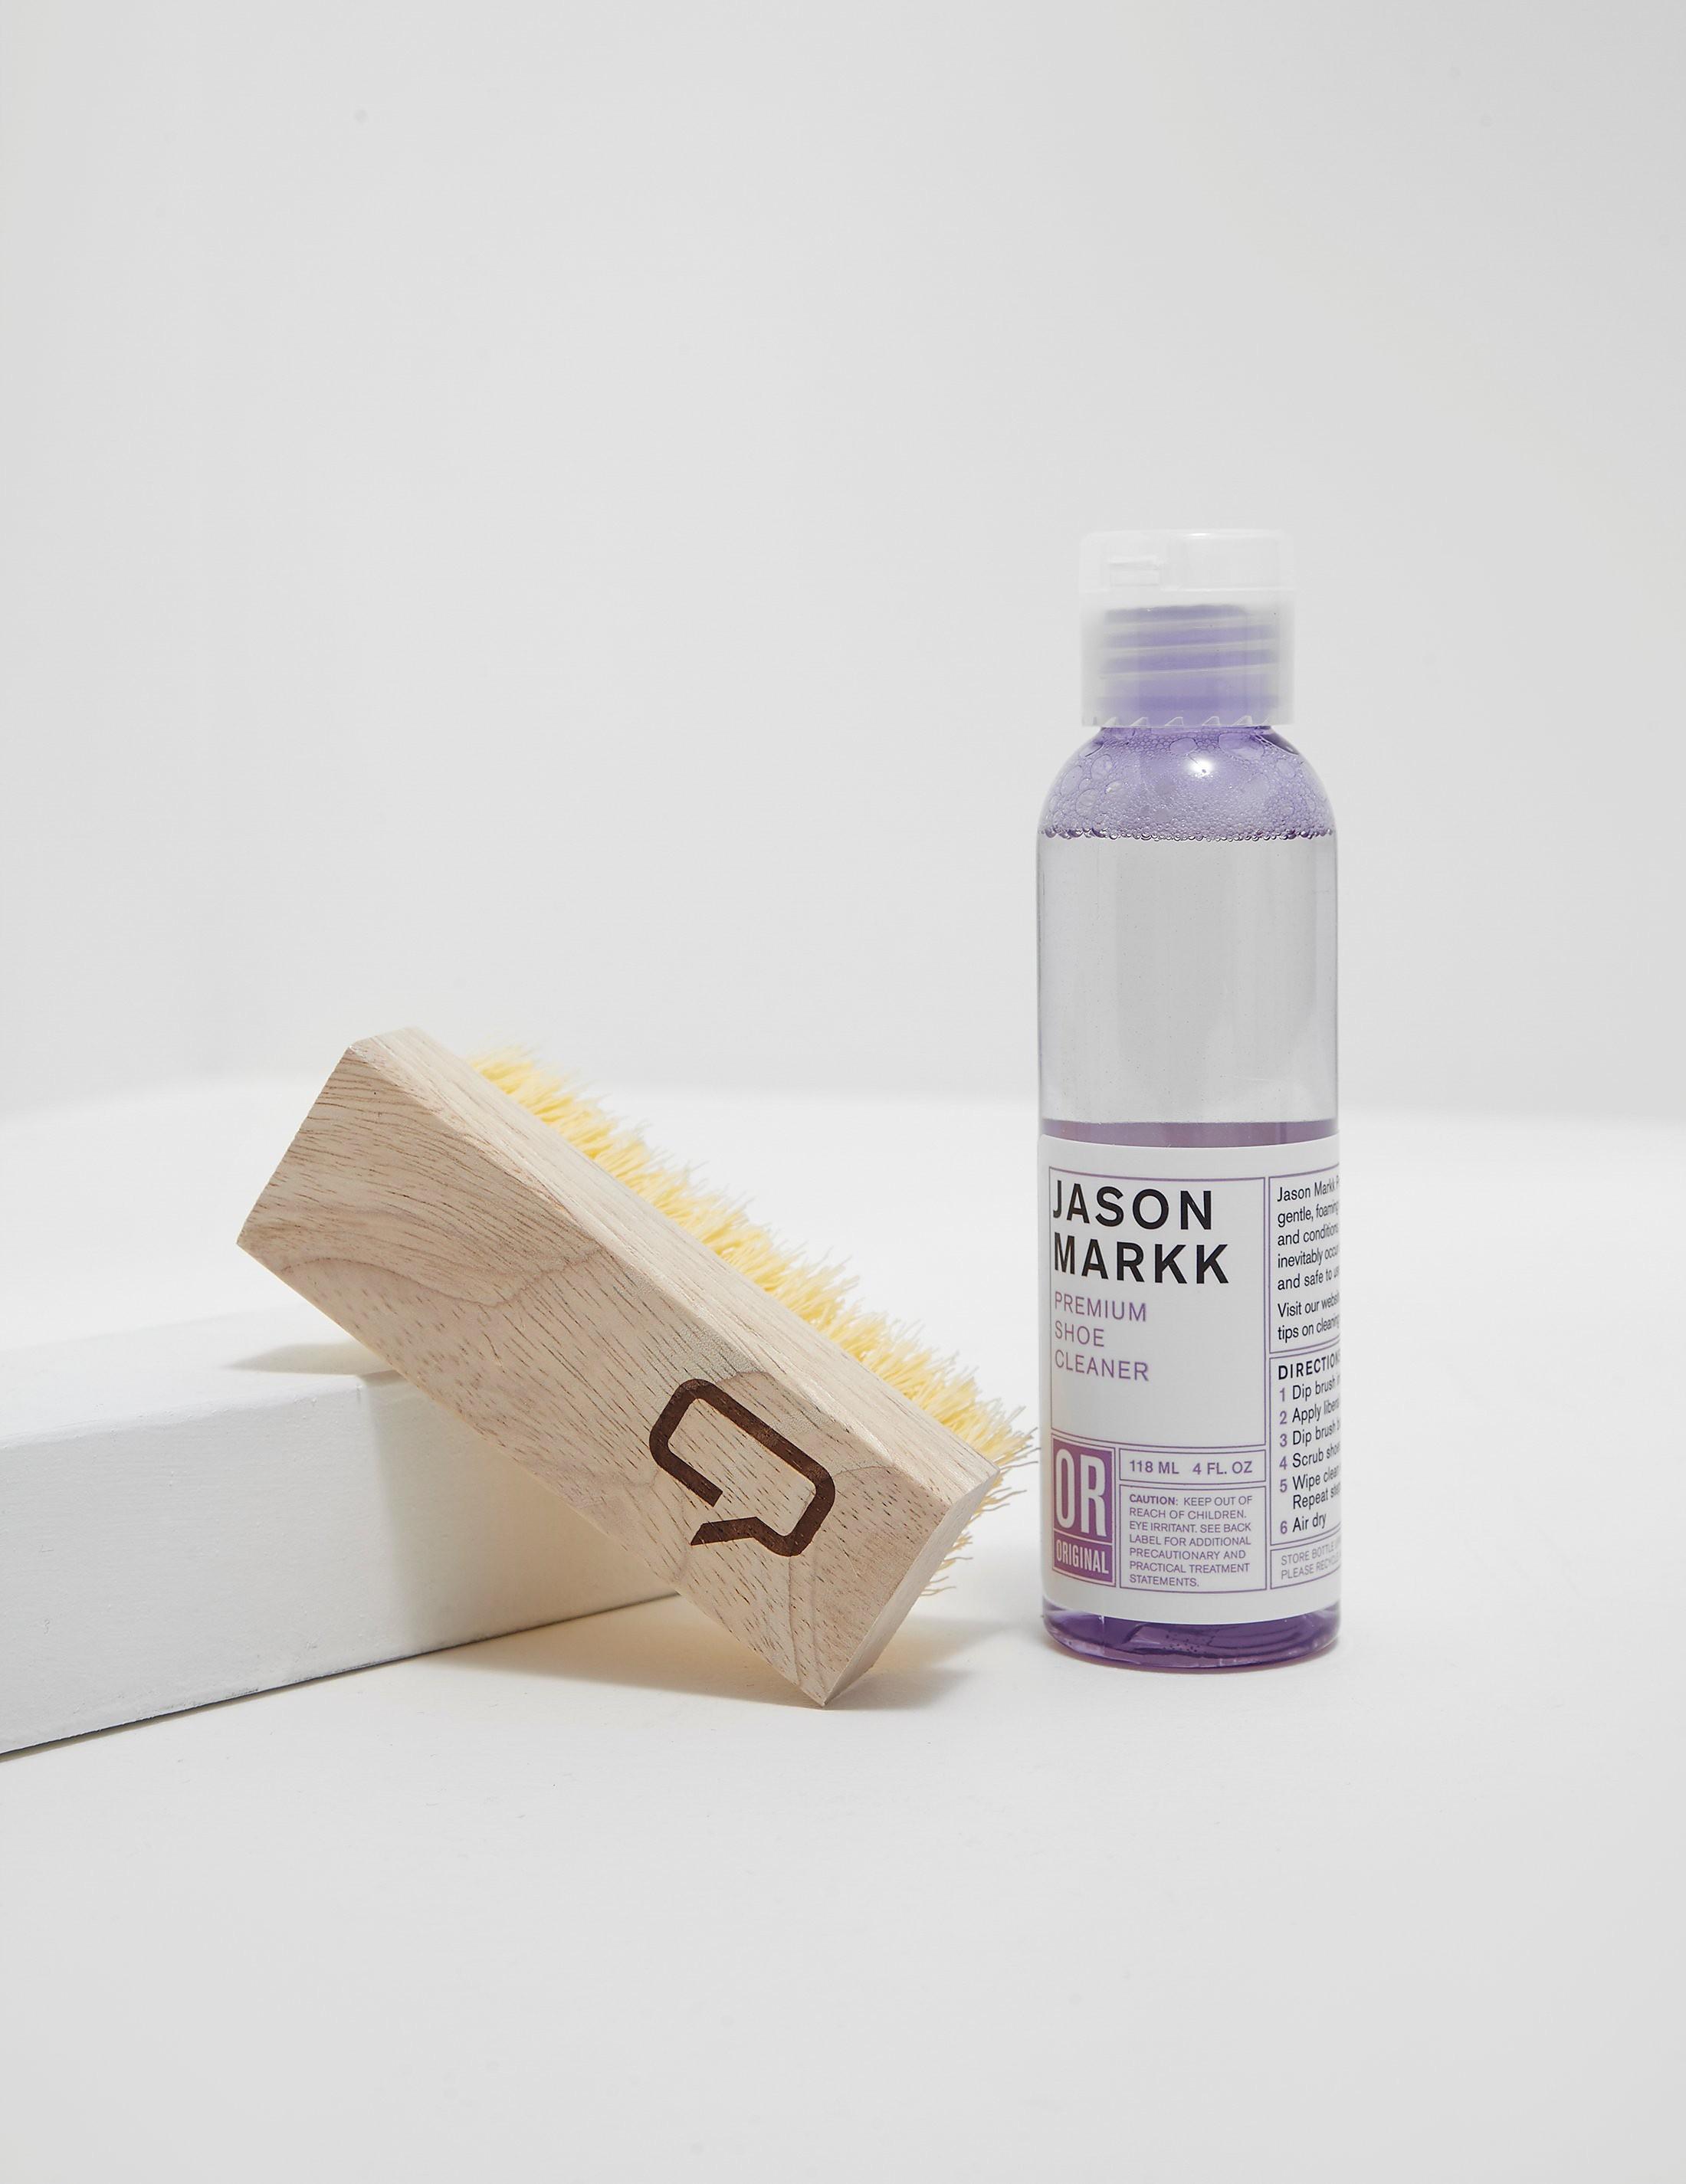 Jason Markk 4OZ Premium Shoe Cleaning Kit